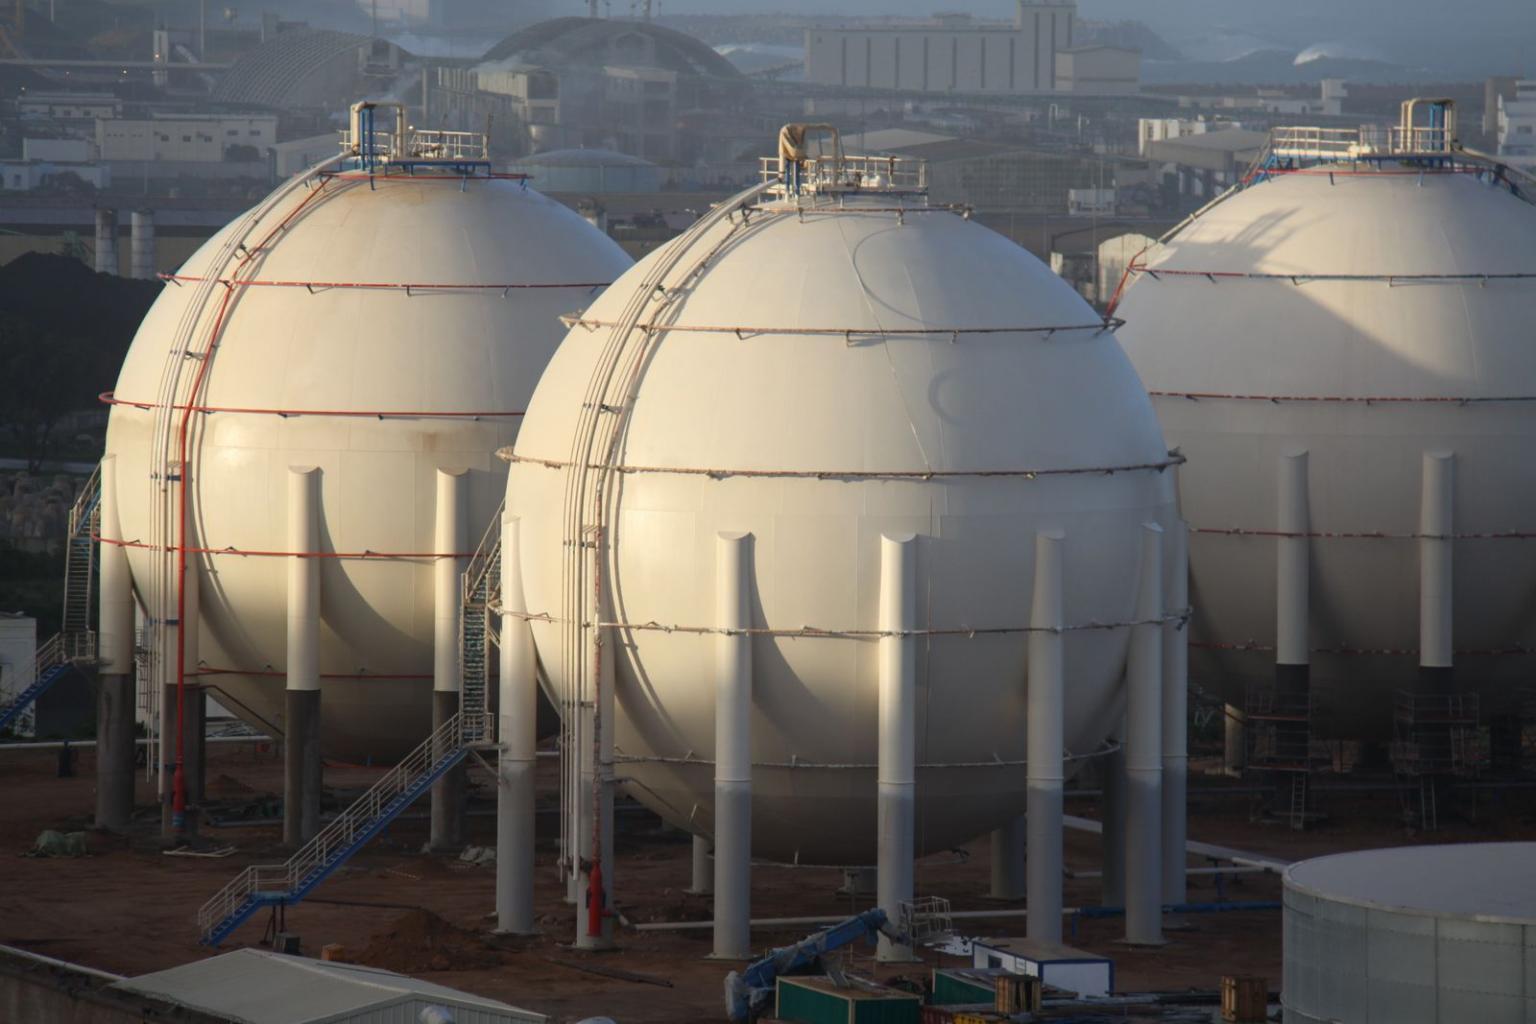 Butane gas storage tanks, Morocco (copyright Tissot)